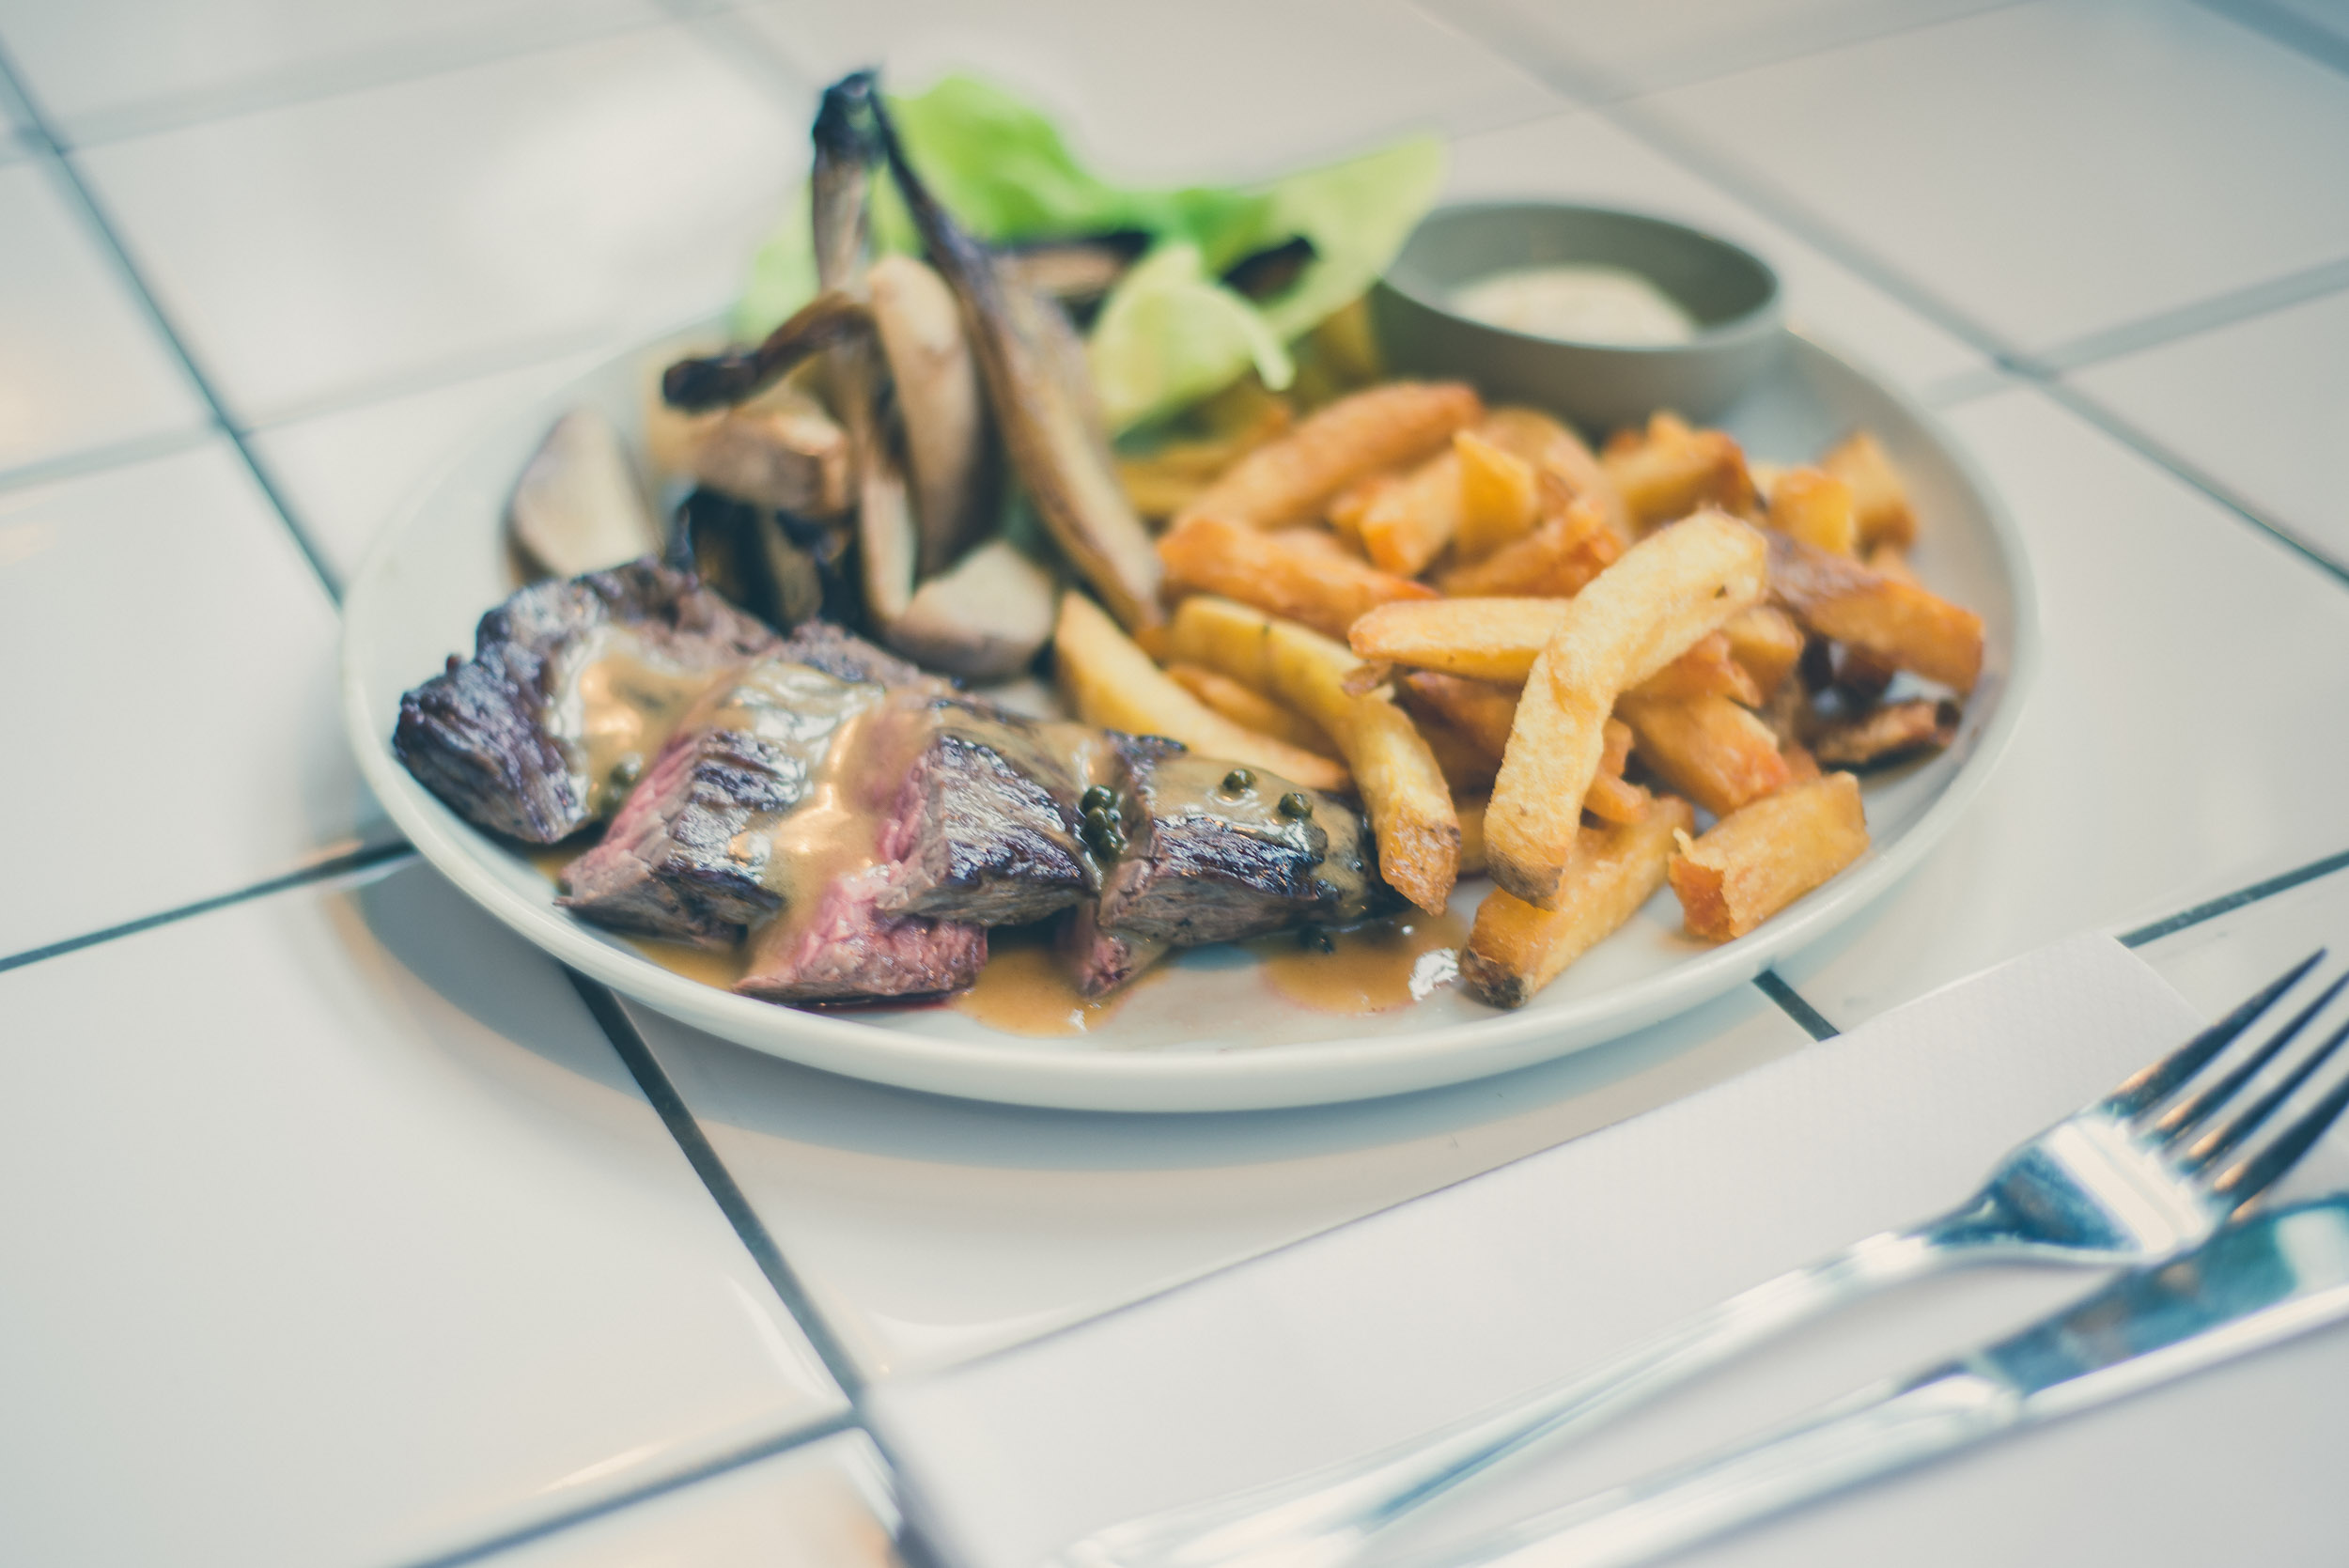 de-klub-lunch-steak-frites.jpg